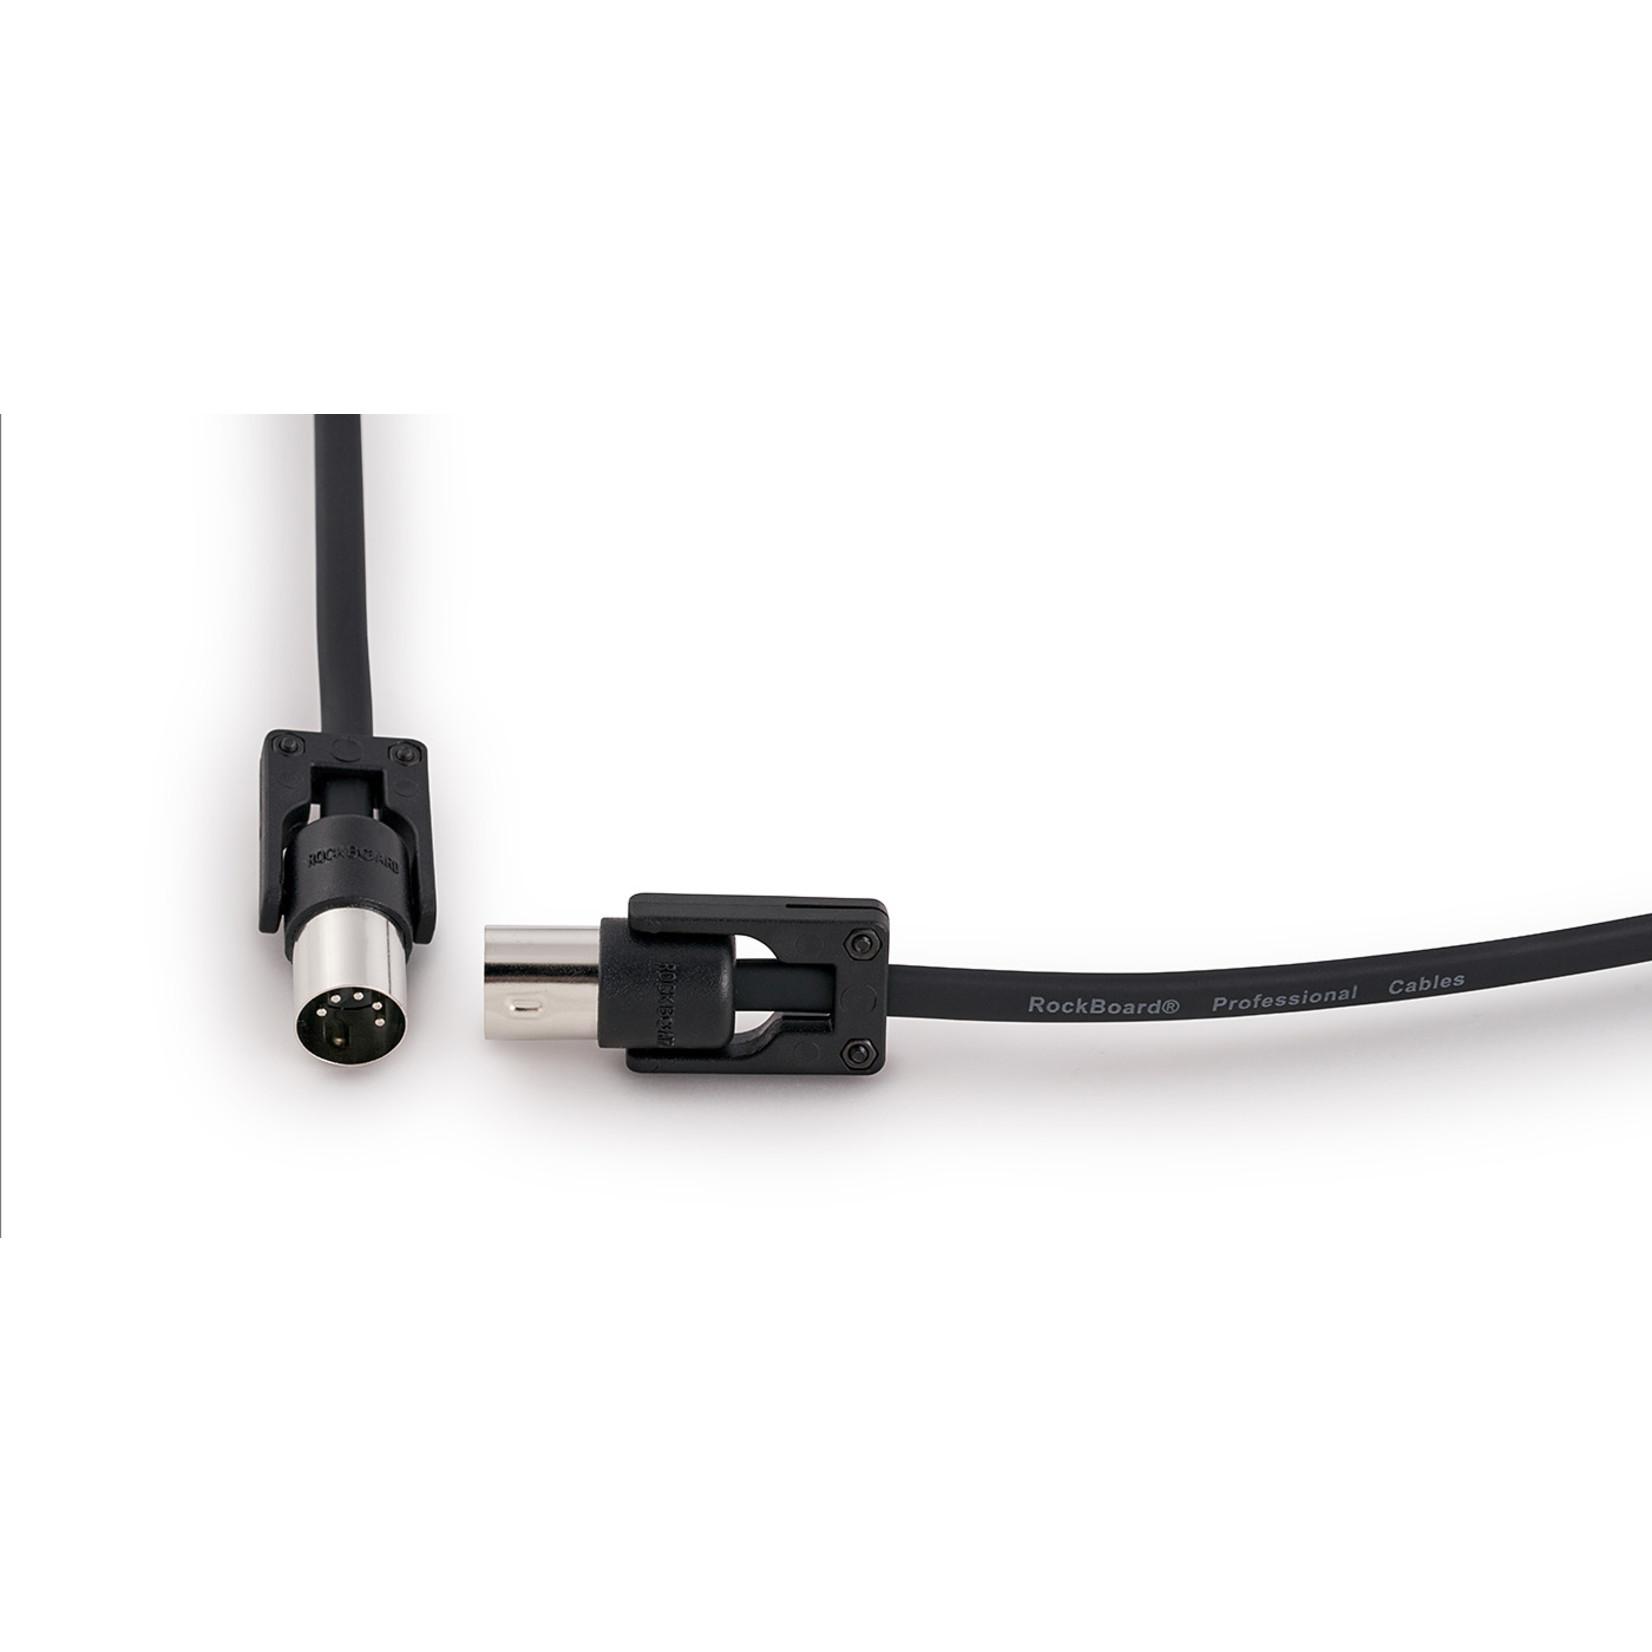 Rockboard RockBoard FlaX Plug 200cm (6.56') flat MIDI Cable - angle or straight (RBO CAB MD FX 200 BK)